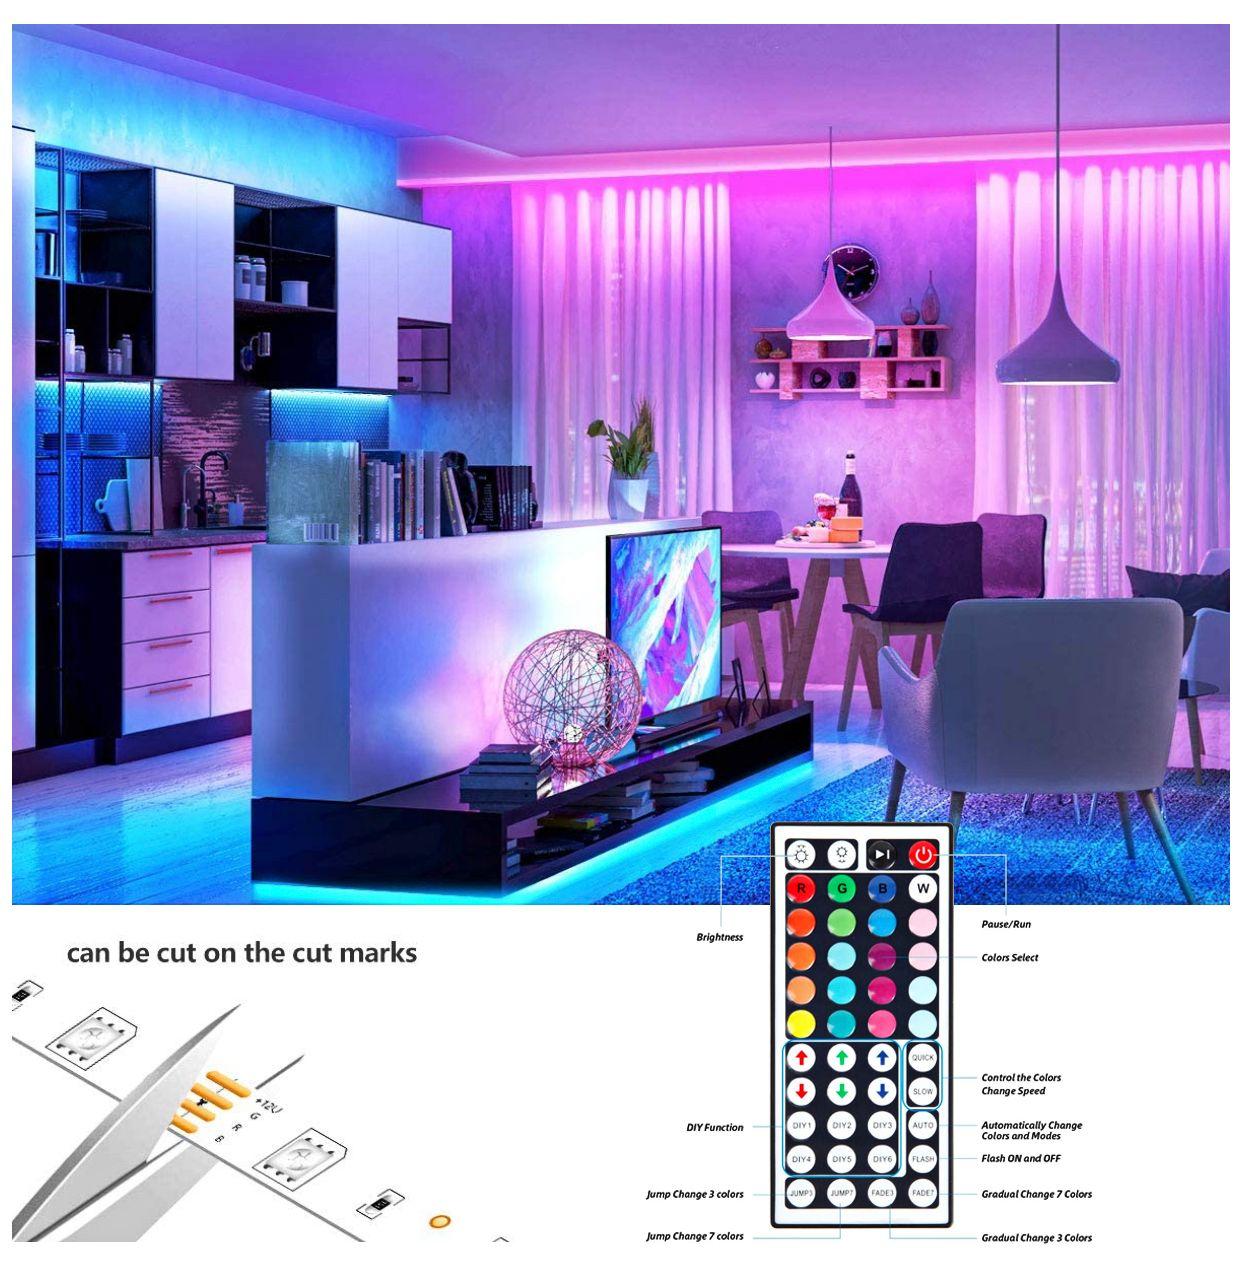 فائقة مشرق ضوء LED قطاع أضواء RGB 16.4Ft / 5M SMD 5050 DC12V مرنة ليه شرائط أضواء 50LED / متر 16Different ثابت الألوان